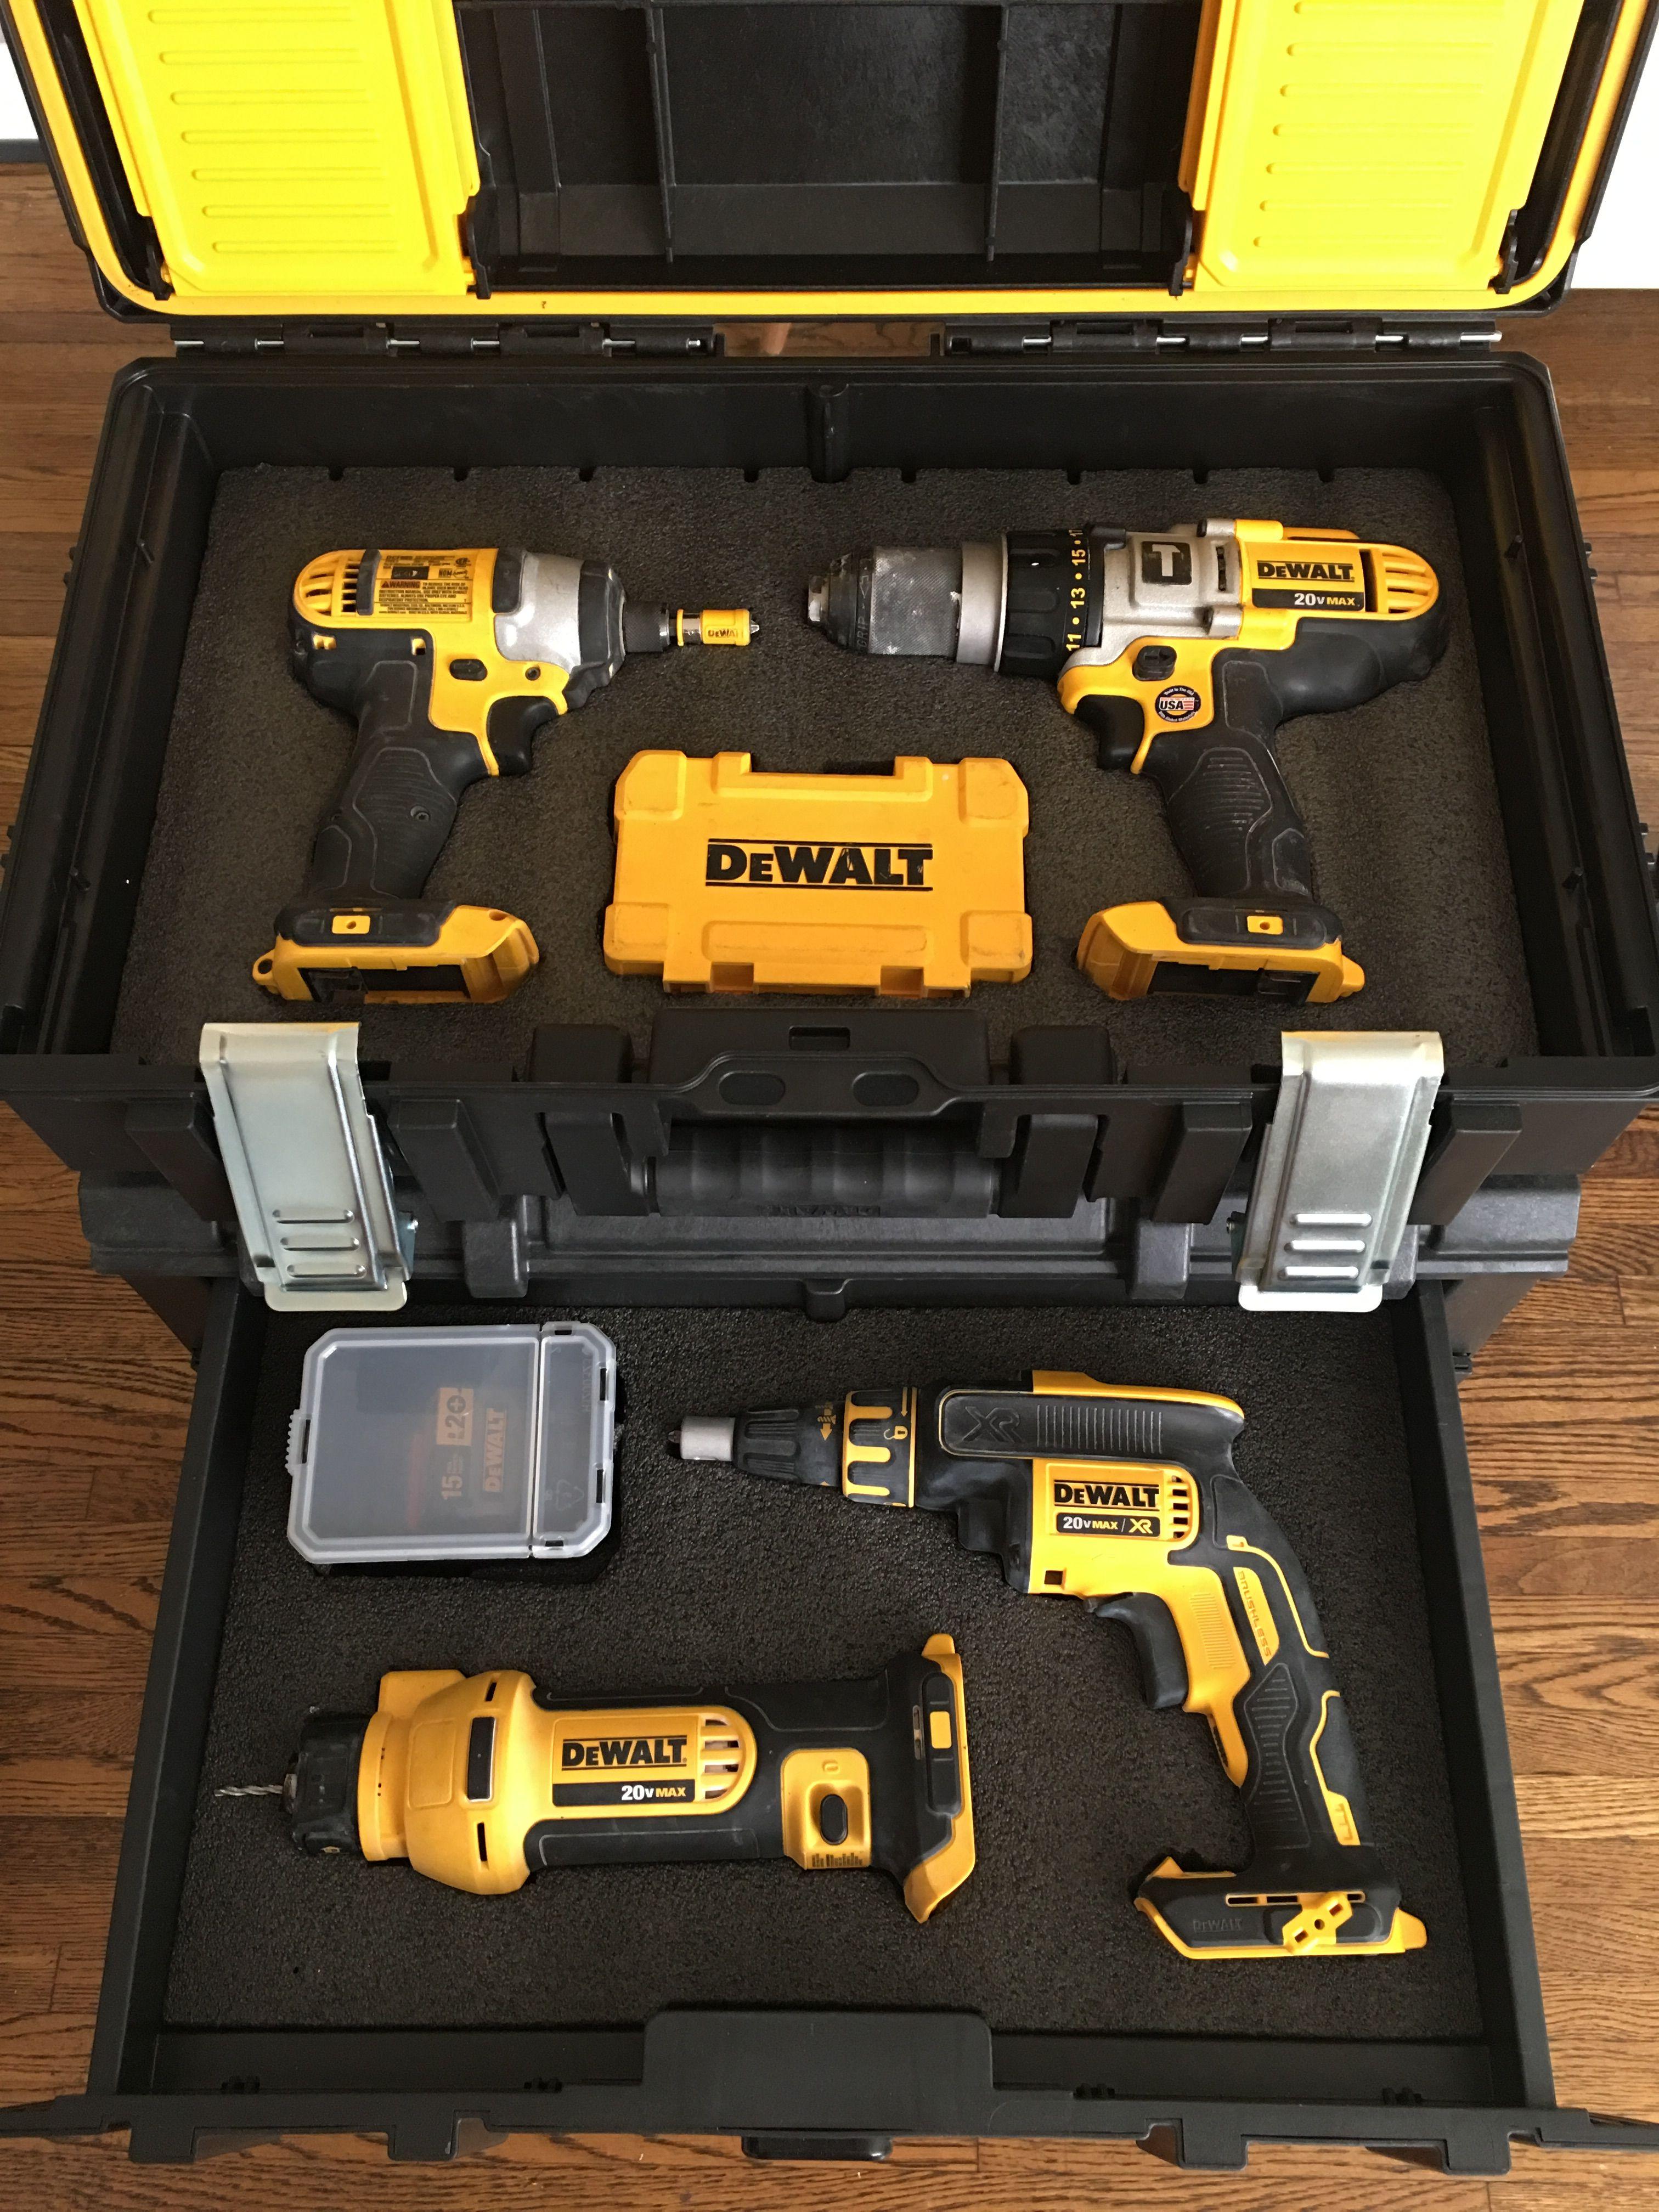 Dewalt Tough System With Kaizen Inserts Dewalt Tough System Dewalt Woodworking Power Tools